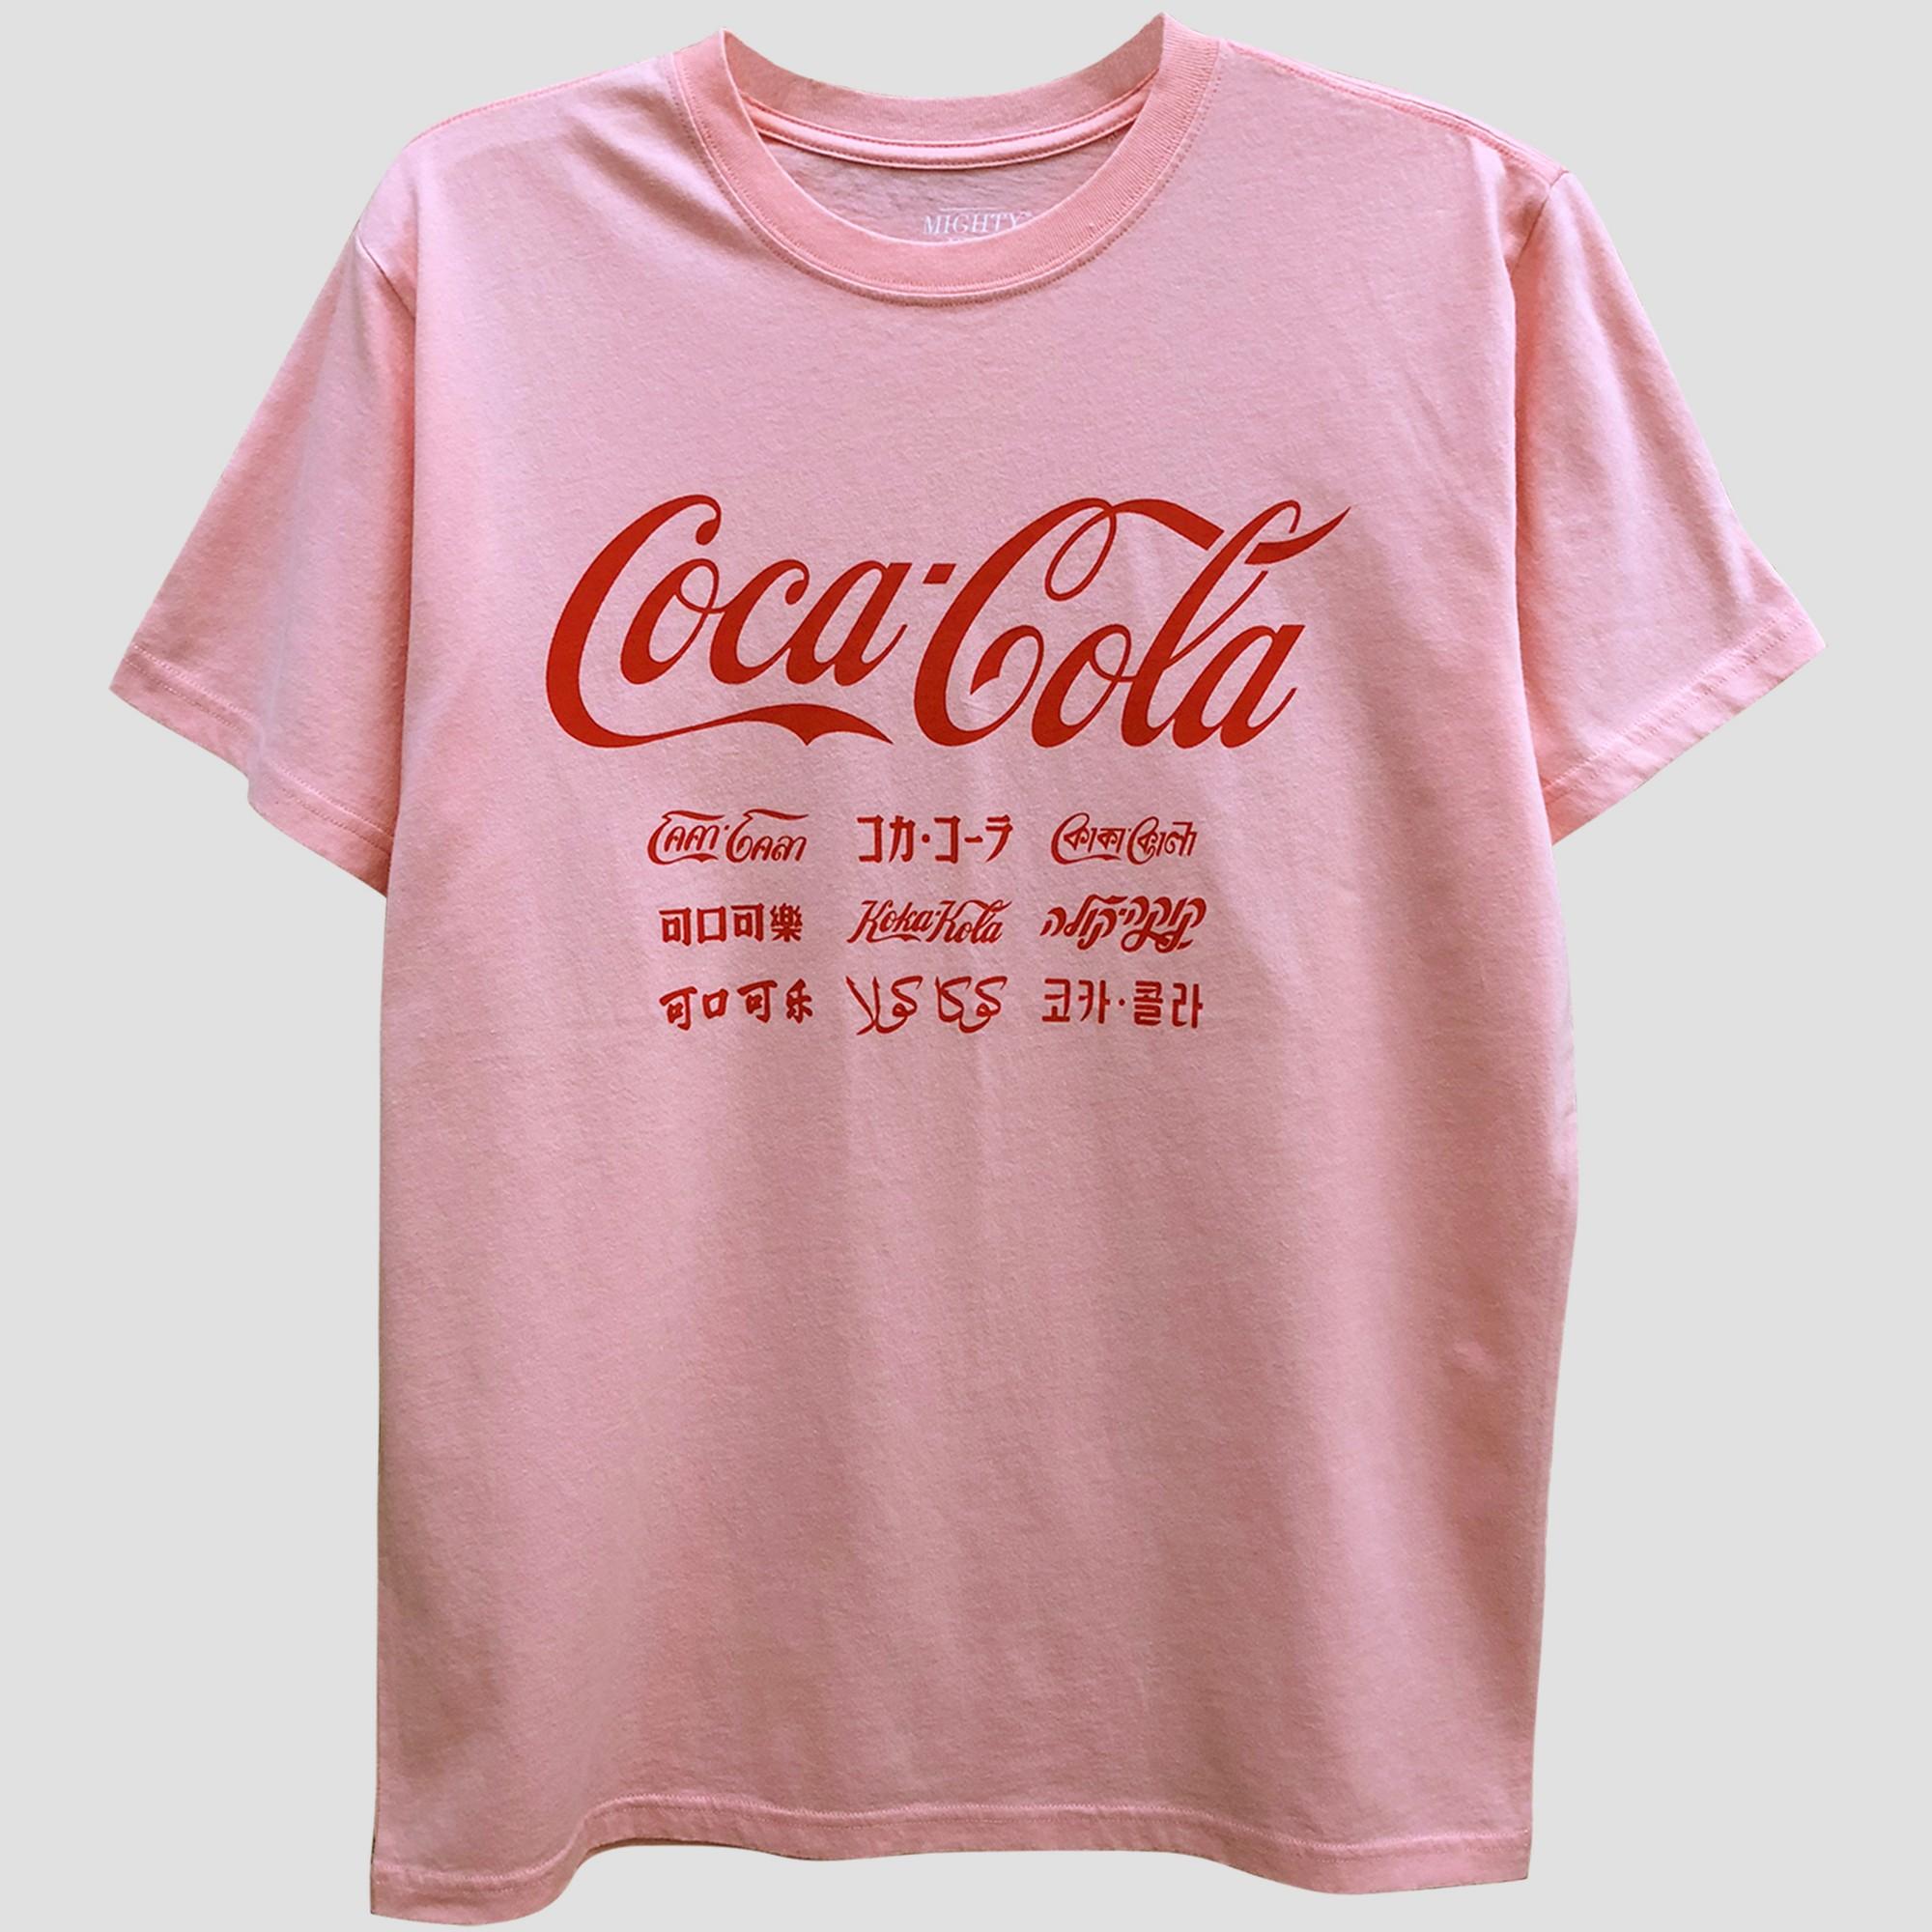 11e73d7dab9 Women s Coca-Cola Short Sleeve Boyfriend Graphic T-Shirt (Juniors ) Blush  L